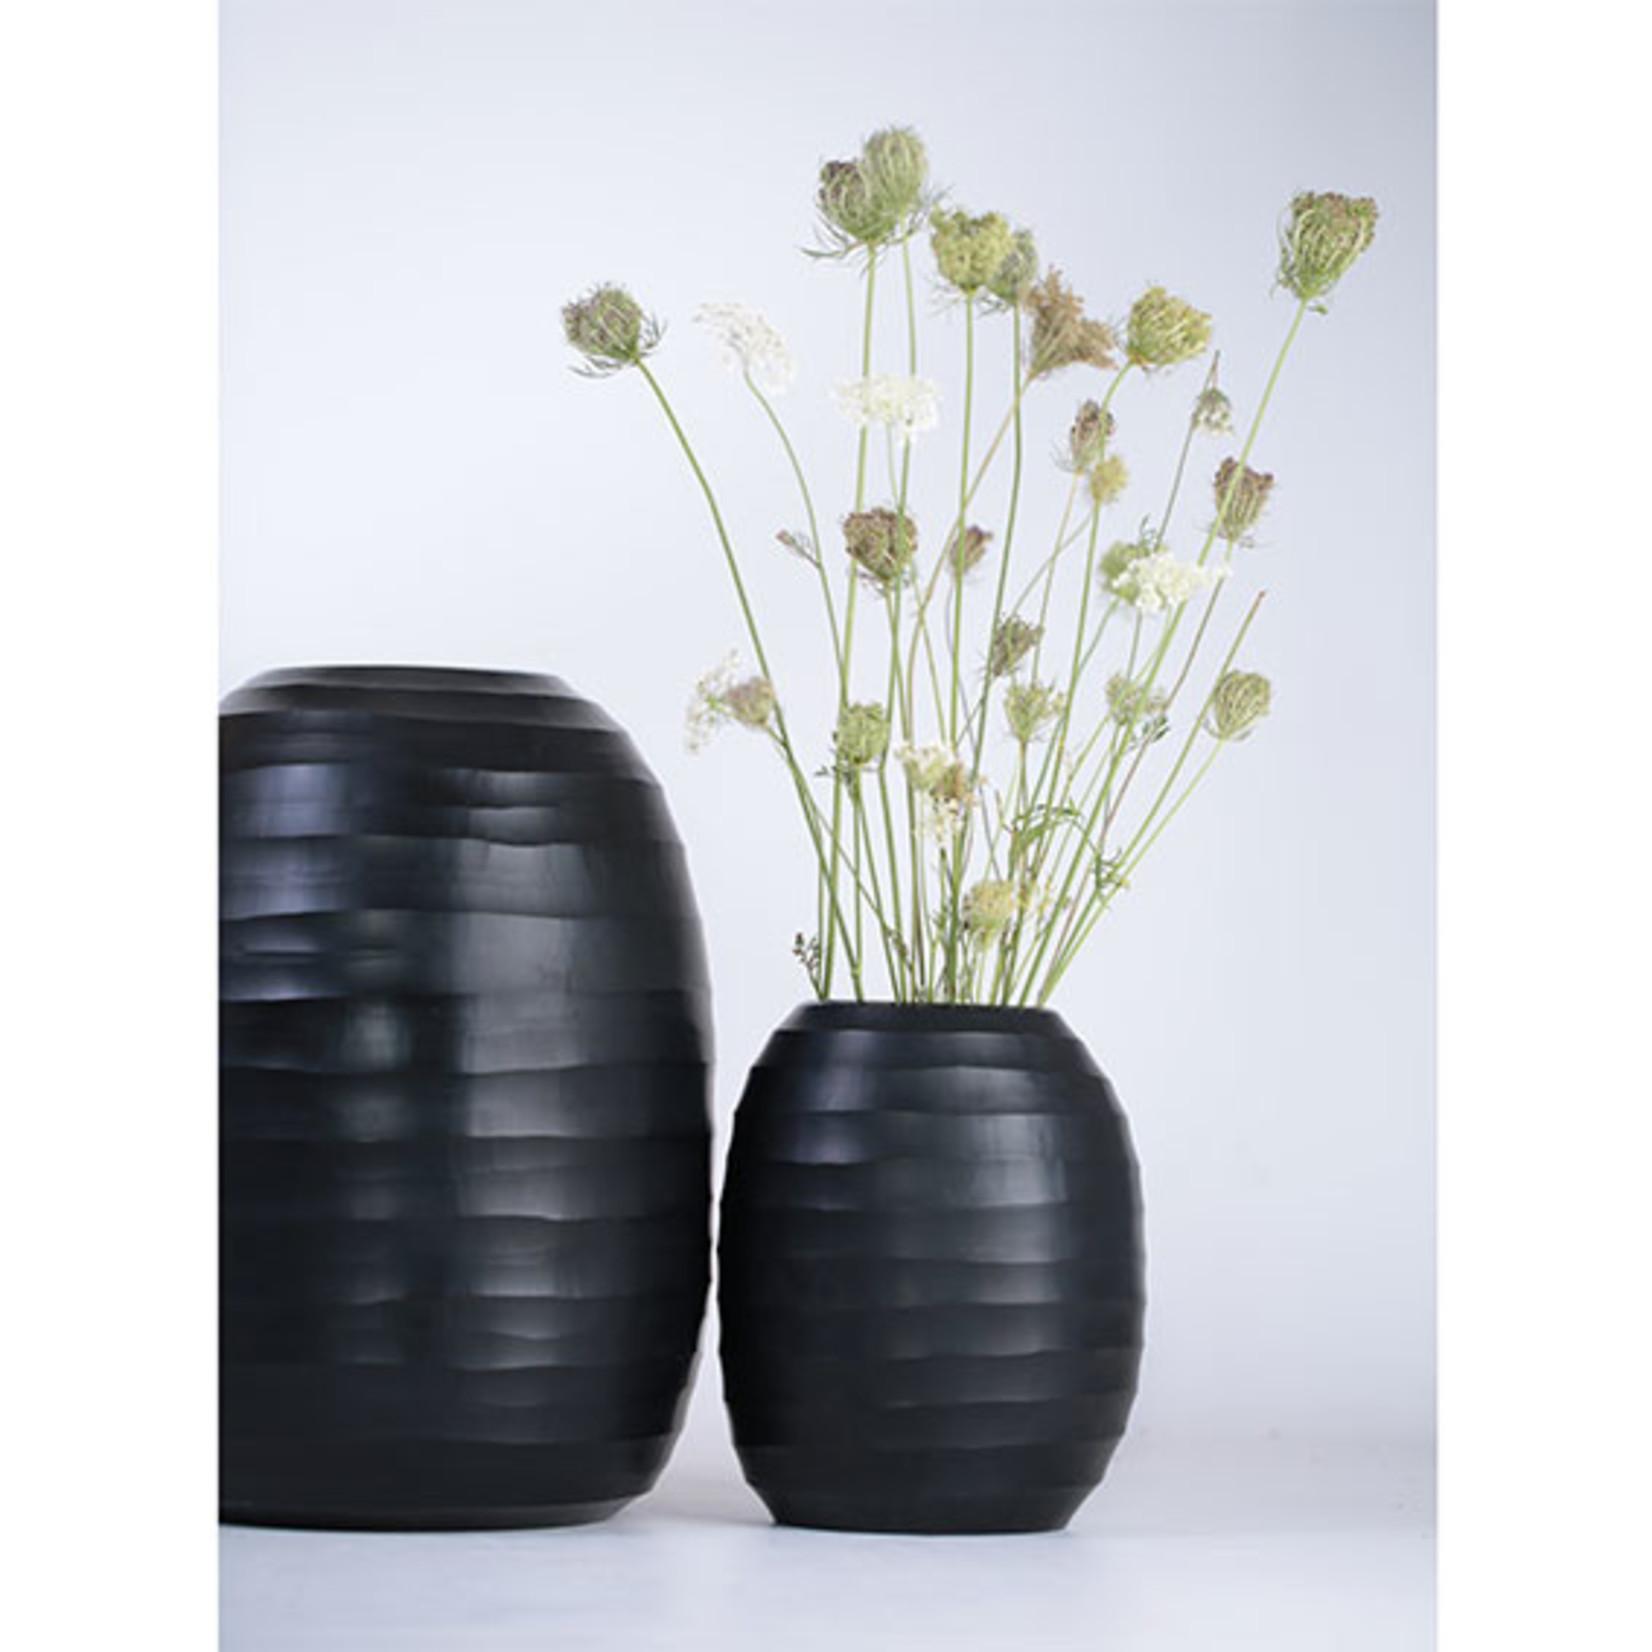 Guaxs Vase Belly XL   black